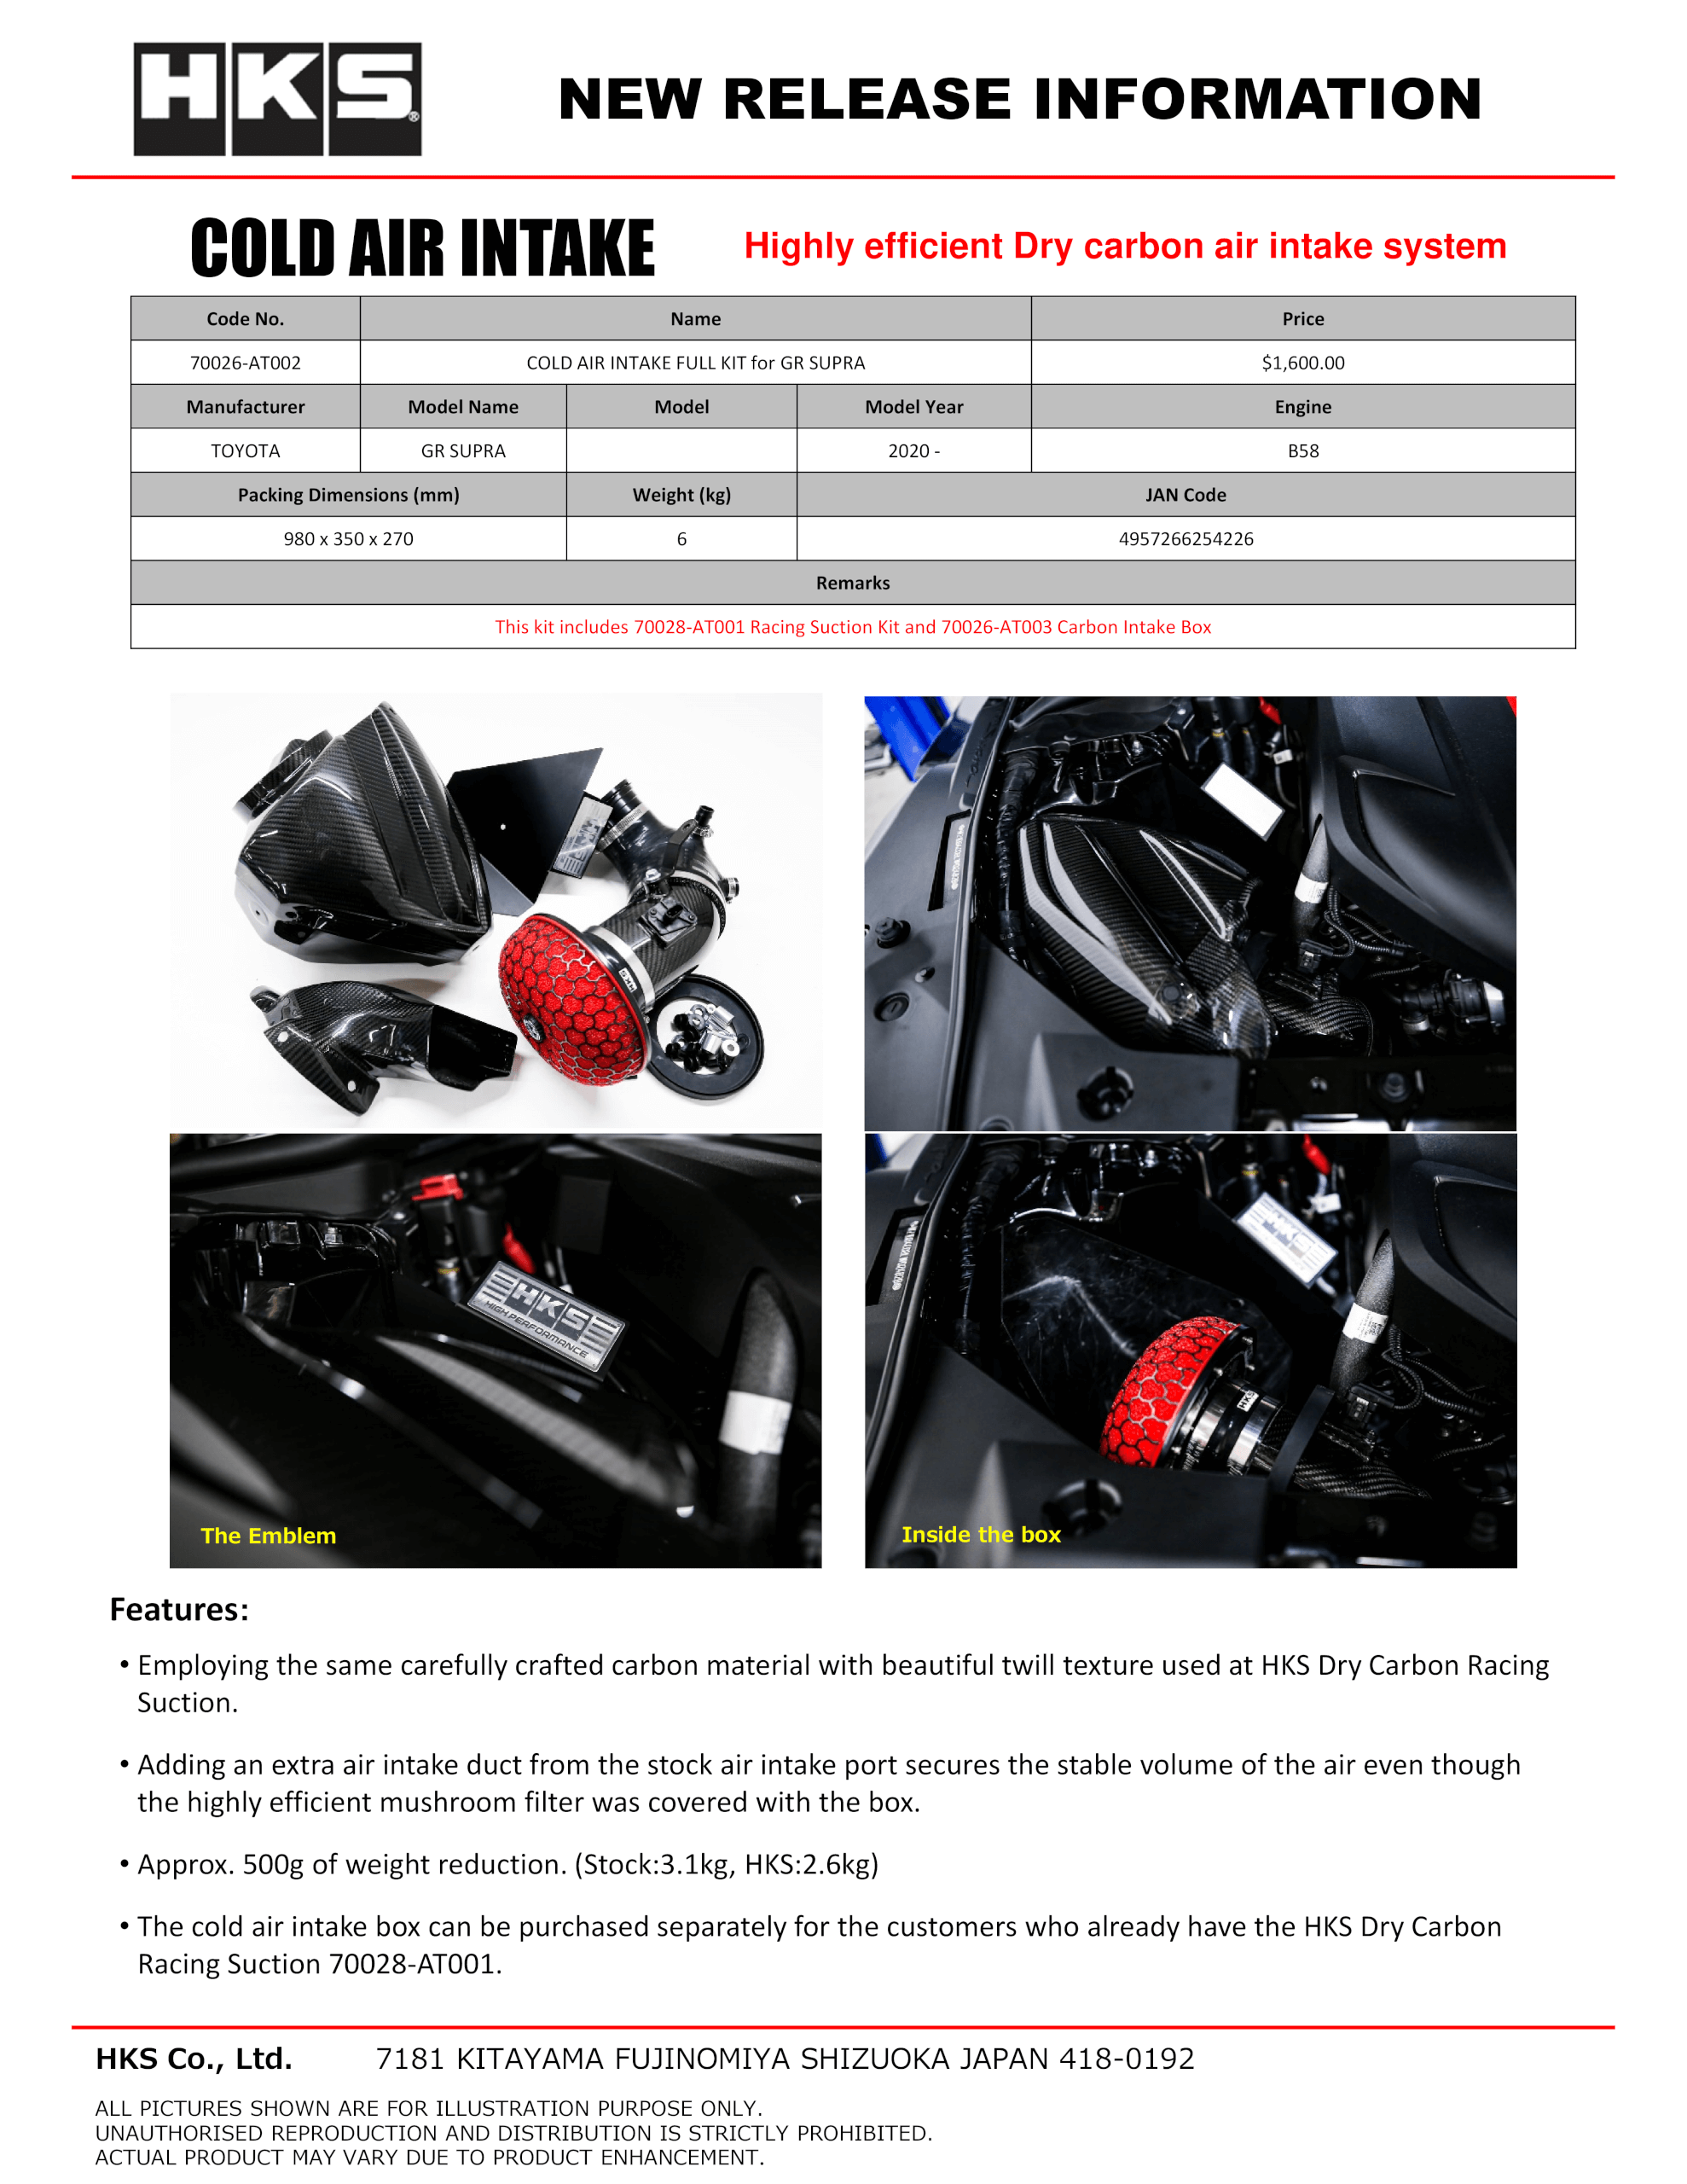 70026-AT002_COLD AIR INTAKE FULL KIT for GR SUPRA-01.png